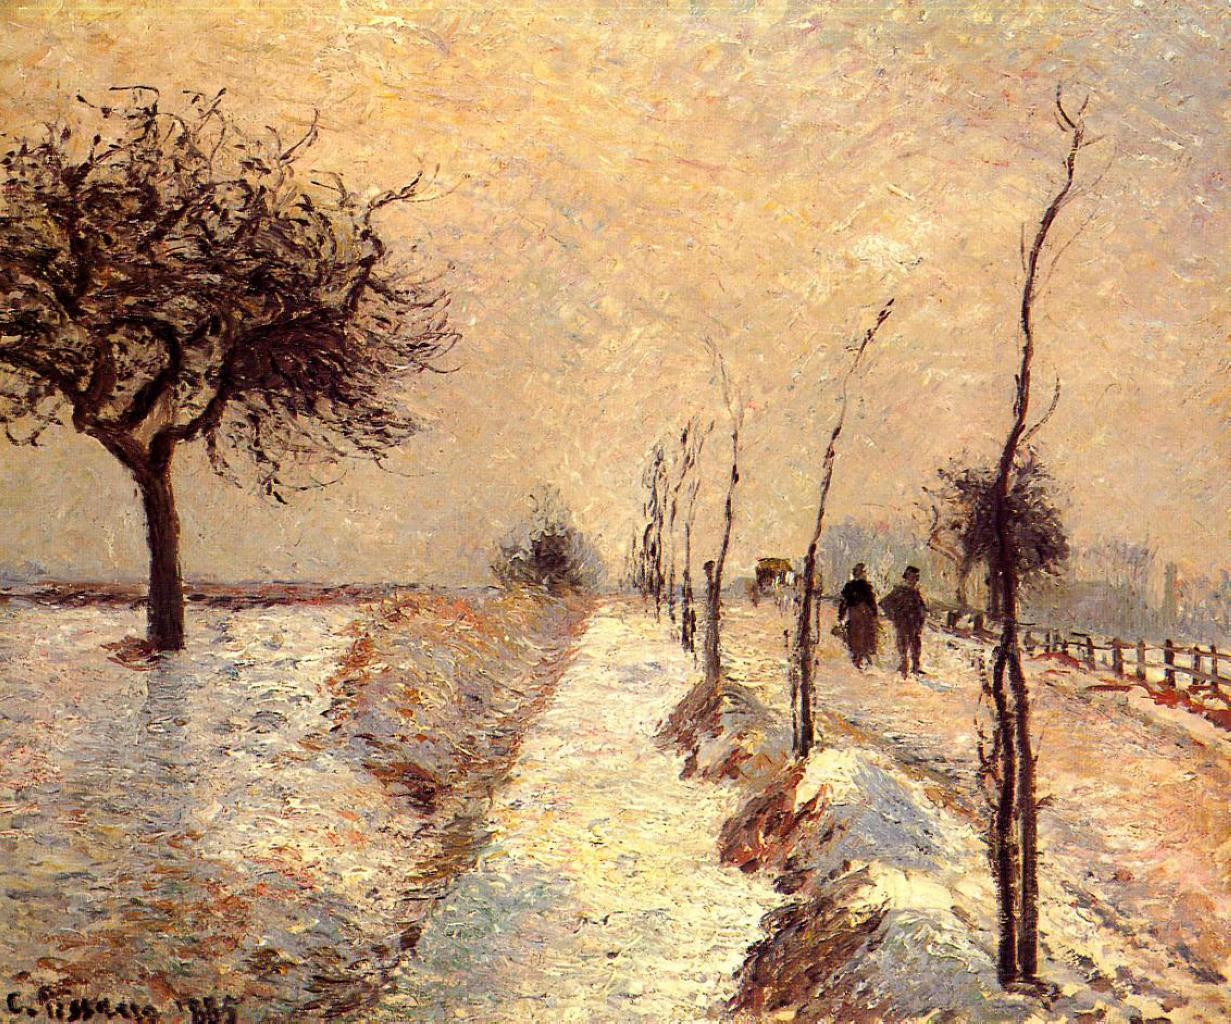 Camille Pissarro - Road at Eragny, Winter (1885)